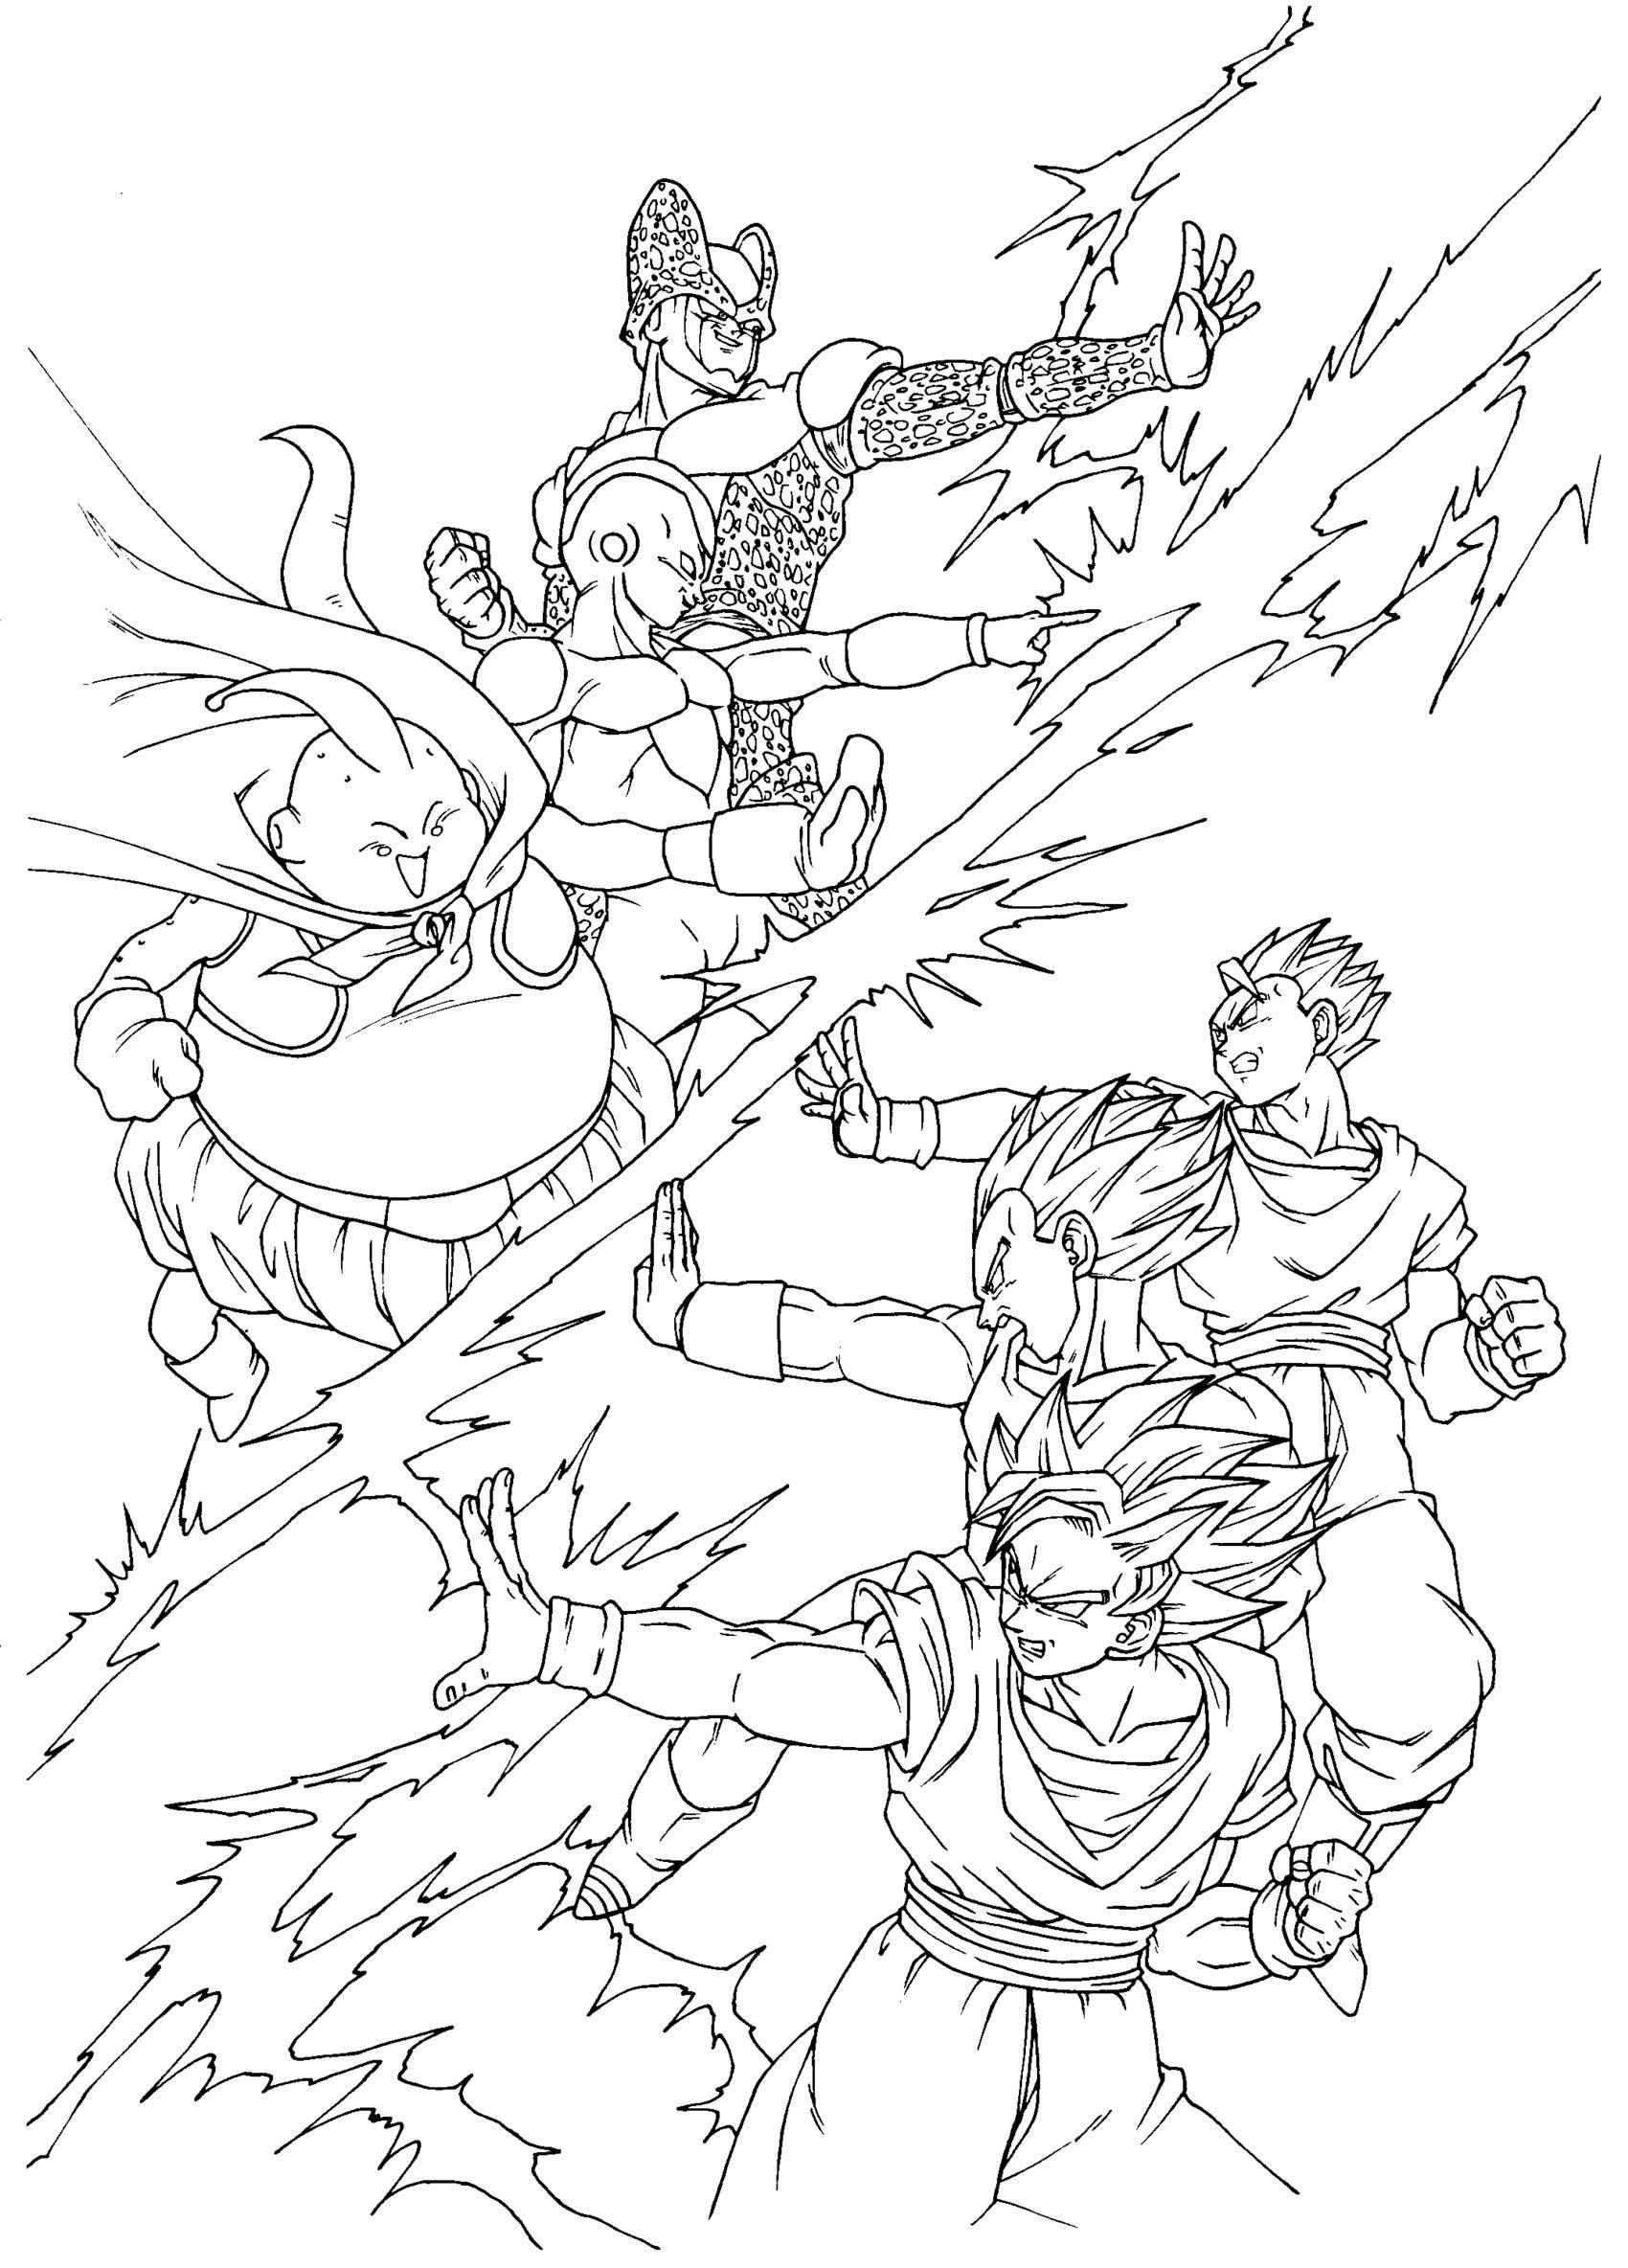 Db team dragon ball desenhos dragonball desenhos